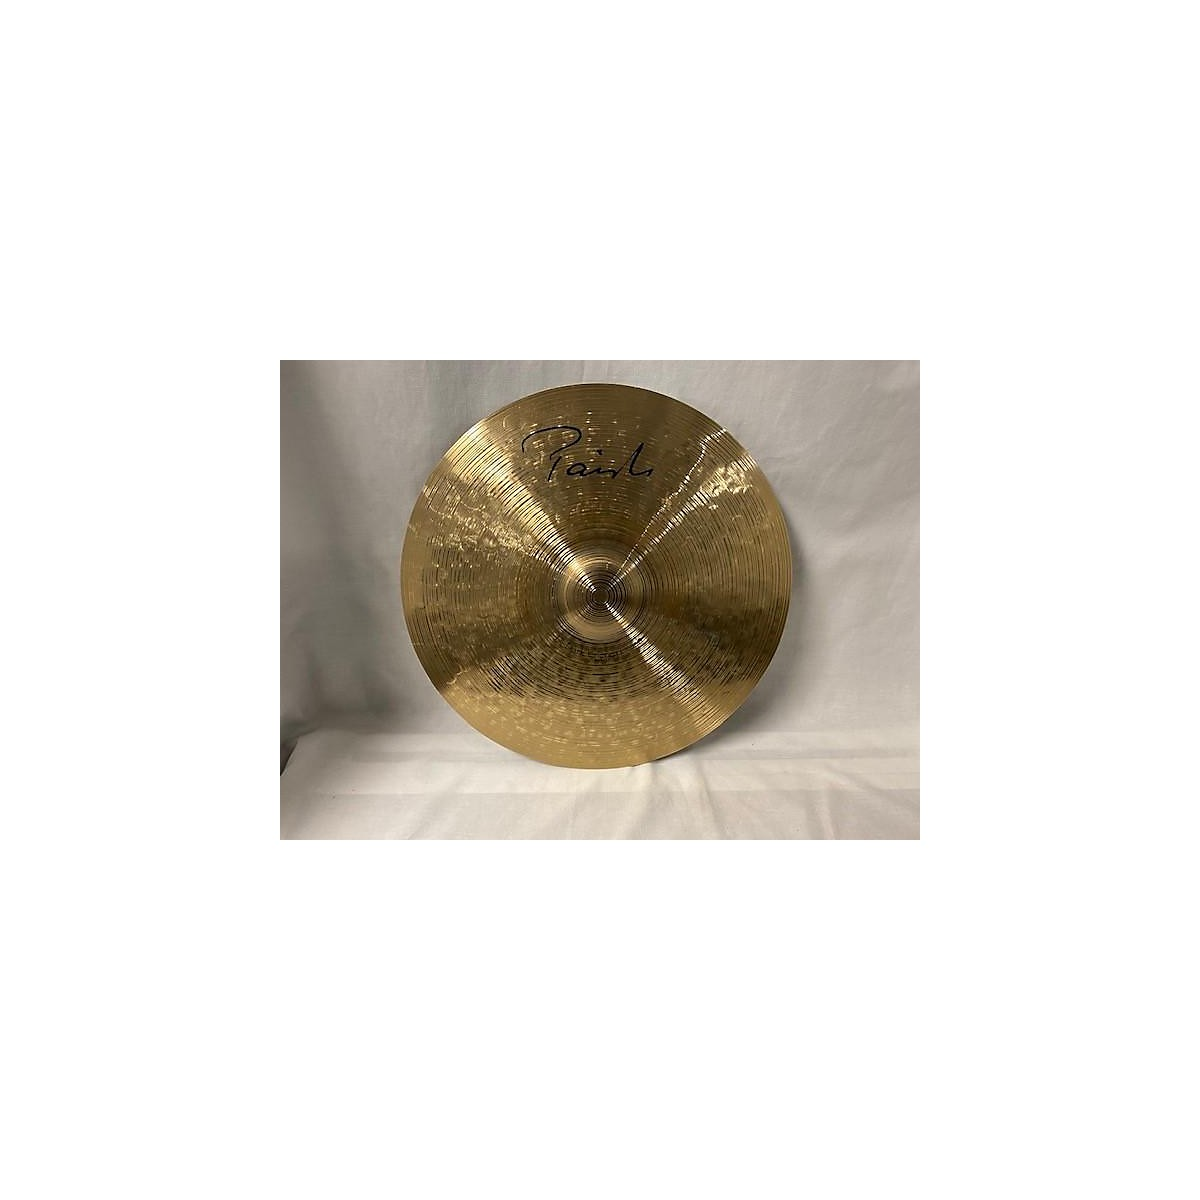 Paiste 17in Signature Dark Energy Crash Mark I Cymbal